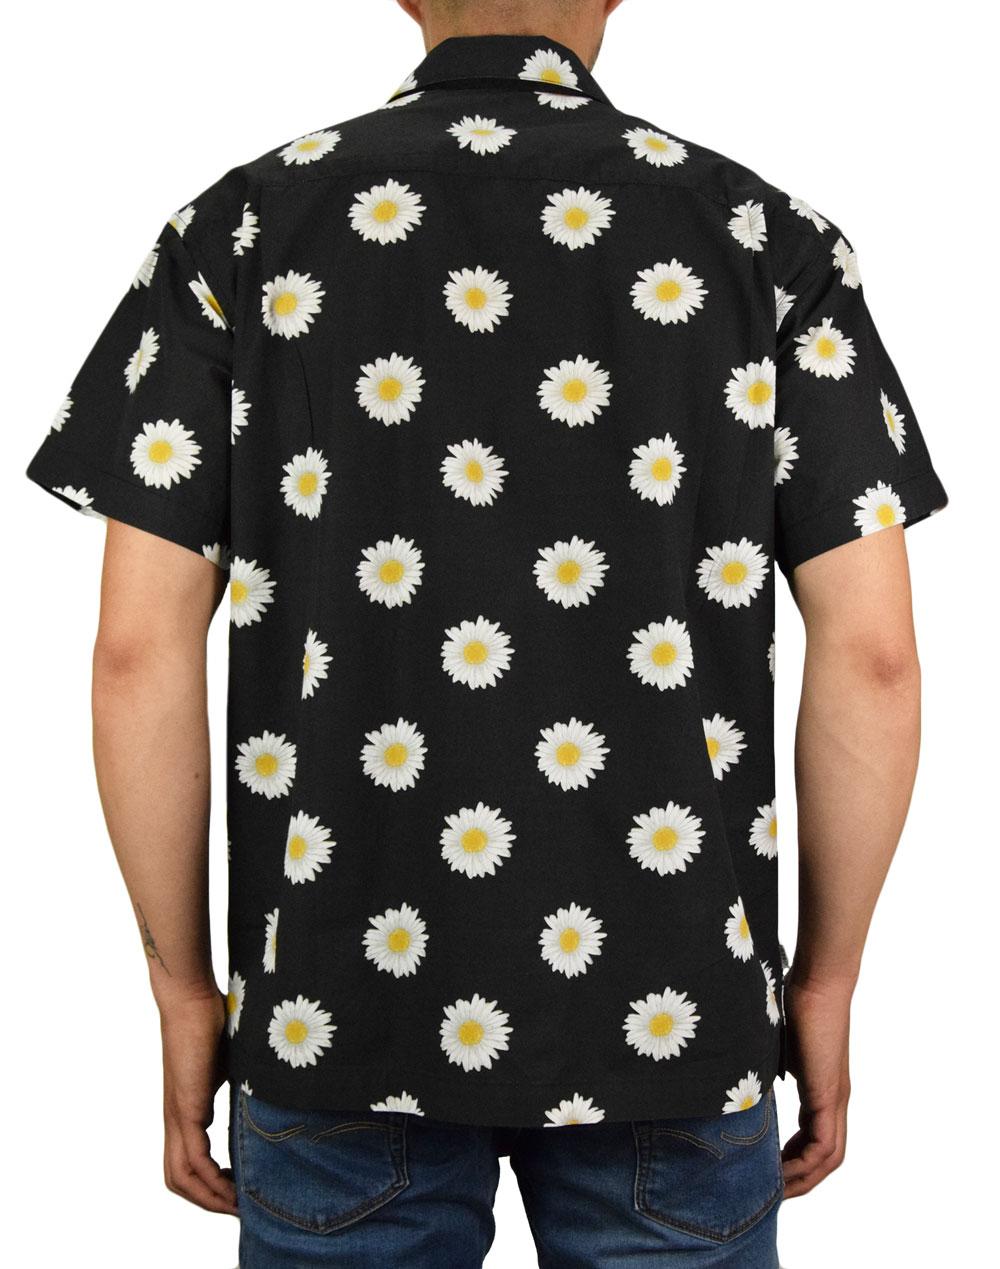 Obey Ideals Organic Daisy Woven T Shirt (181210291) Black Multi